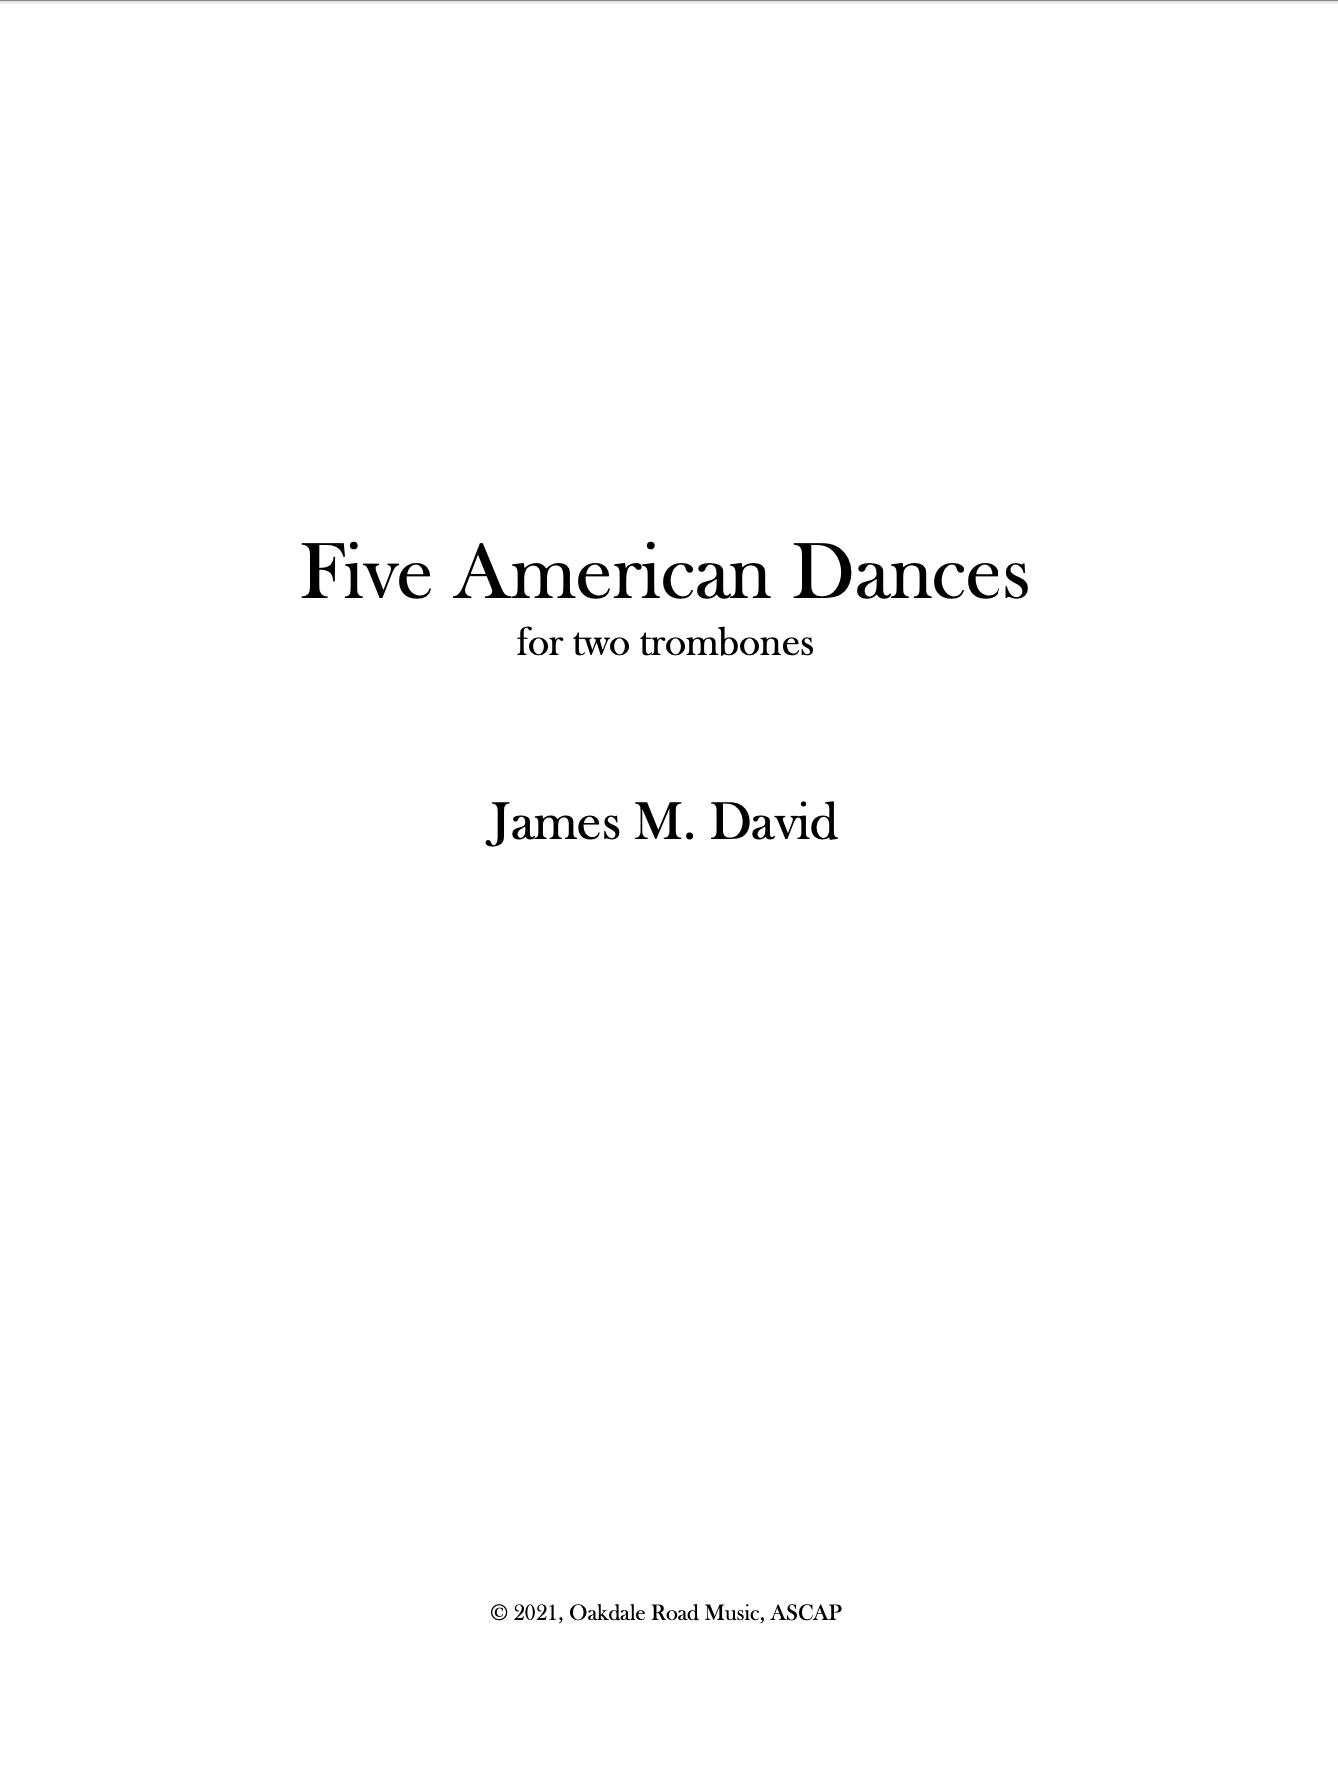 Five American Dances by James David